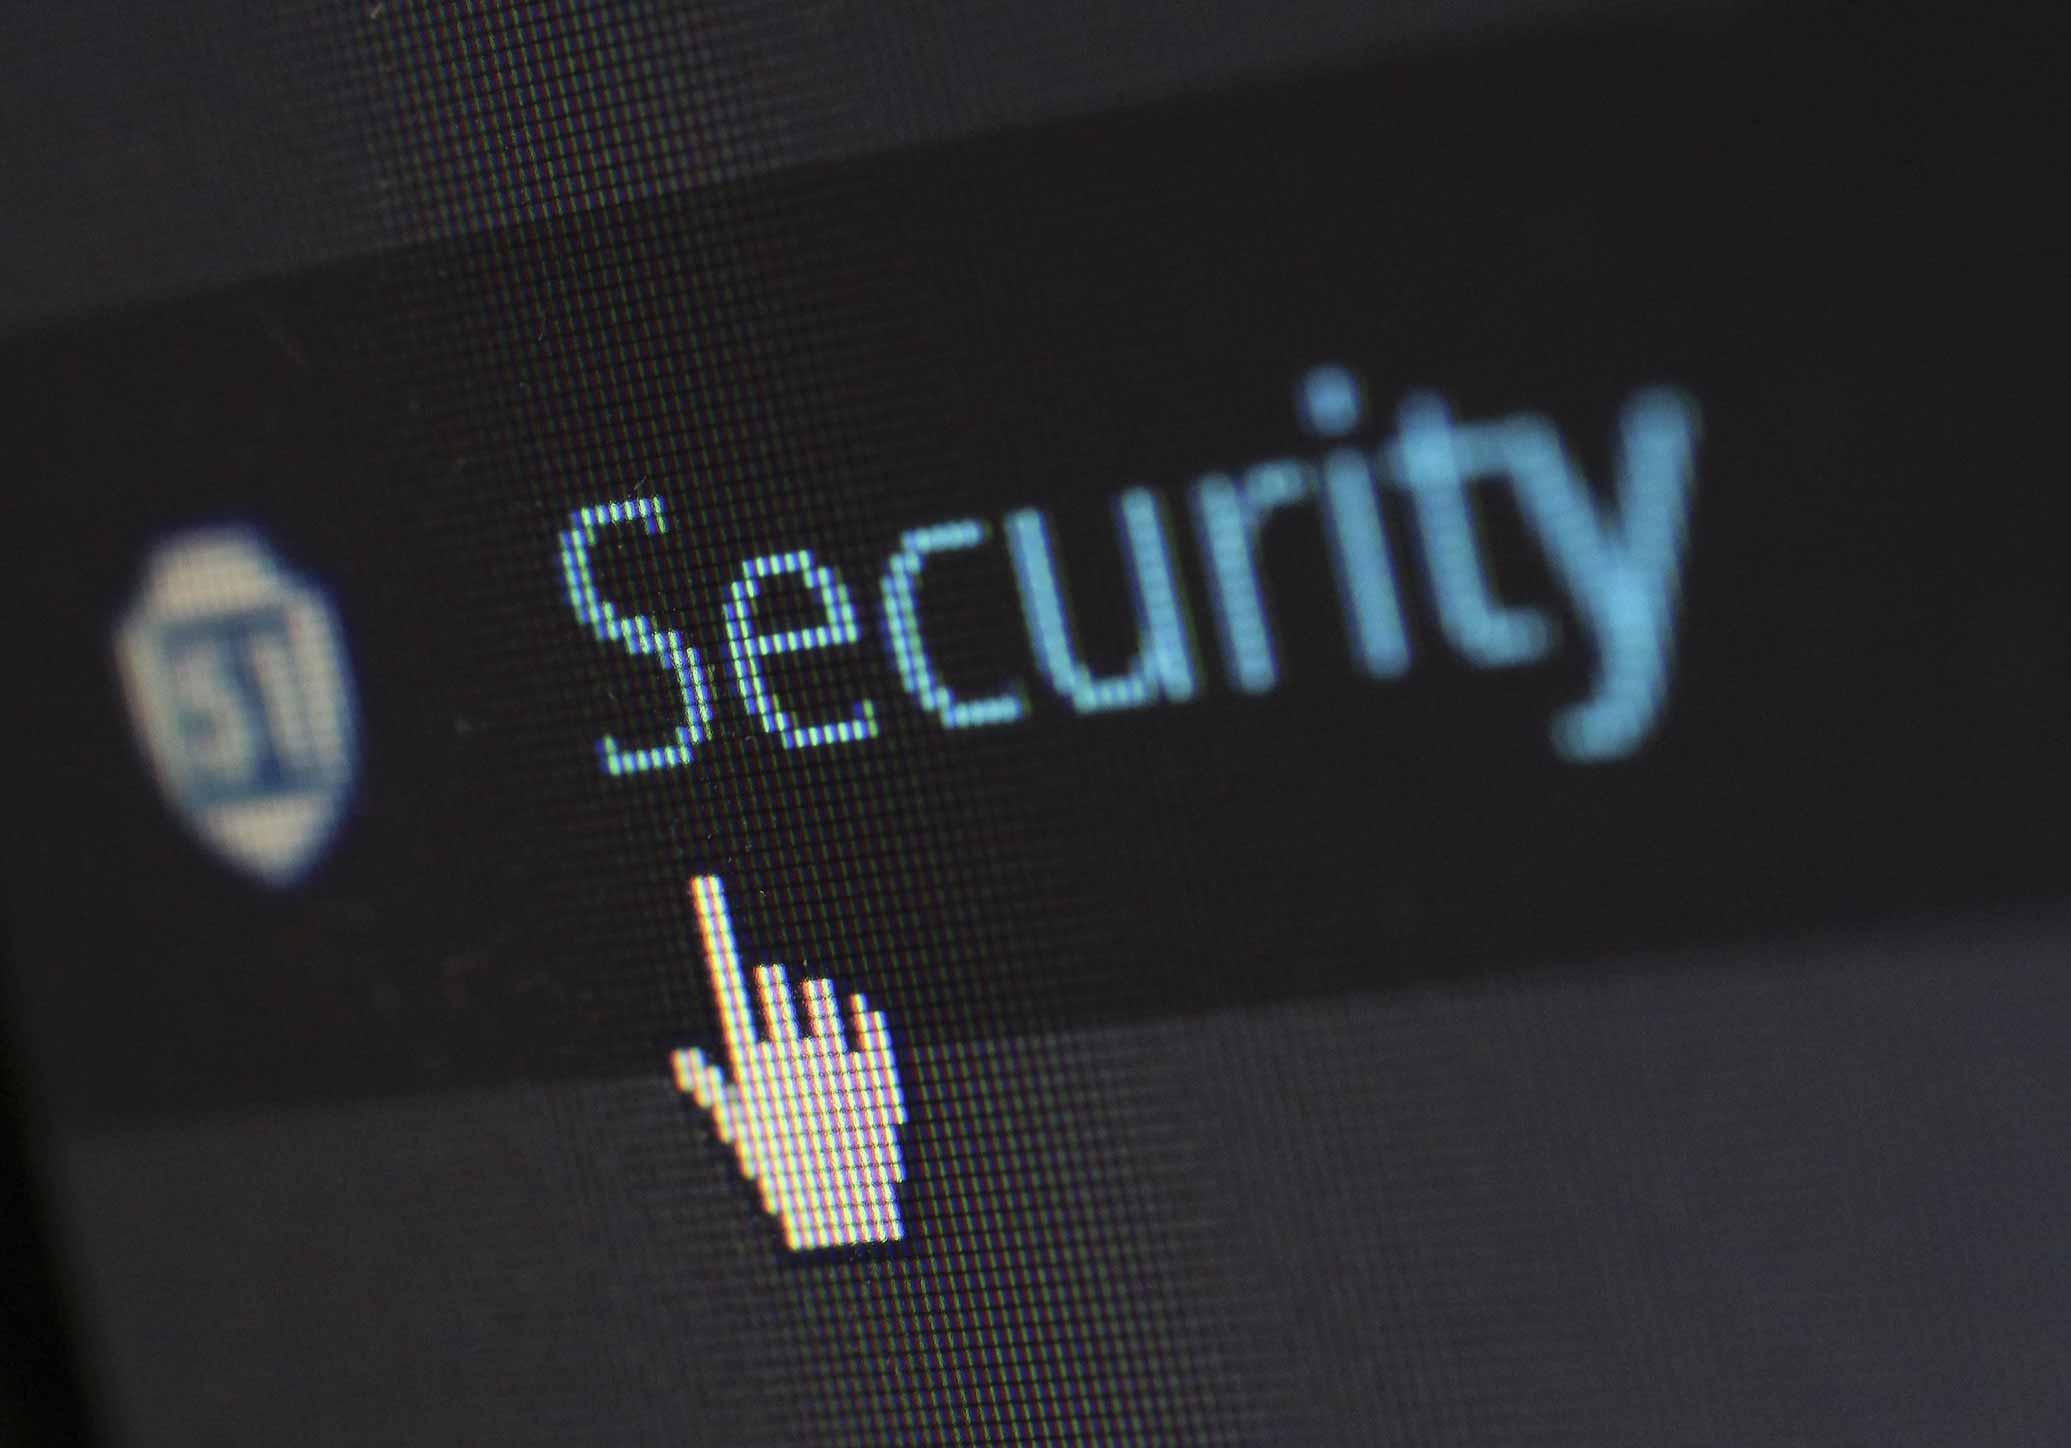 Phishing: o que é e como prevenir o roubo de identidade